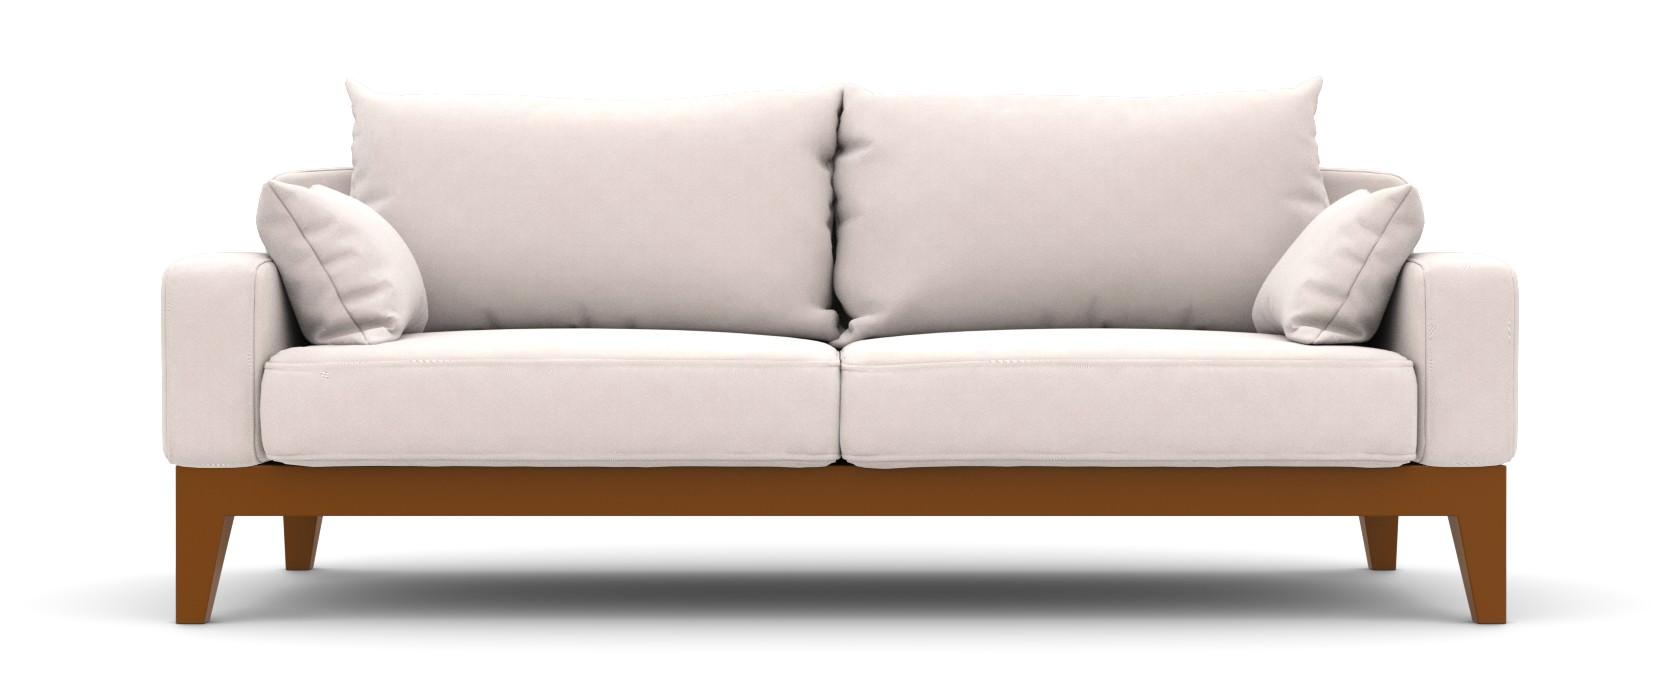 Тримісний диван Antonio - Pufetto